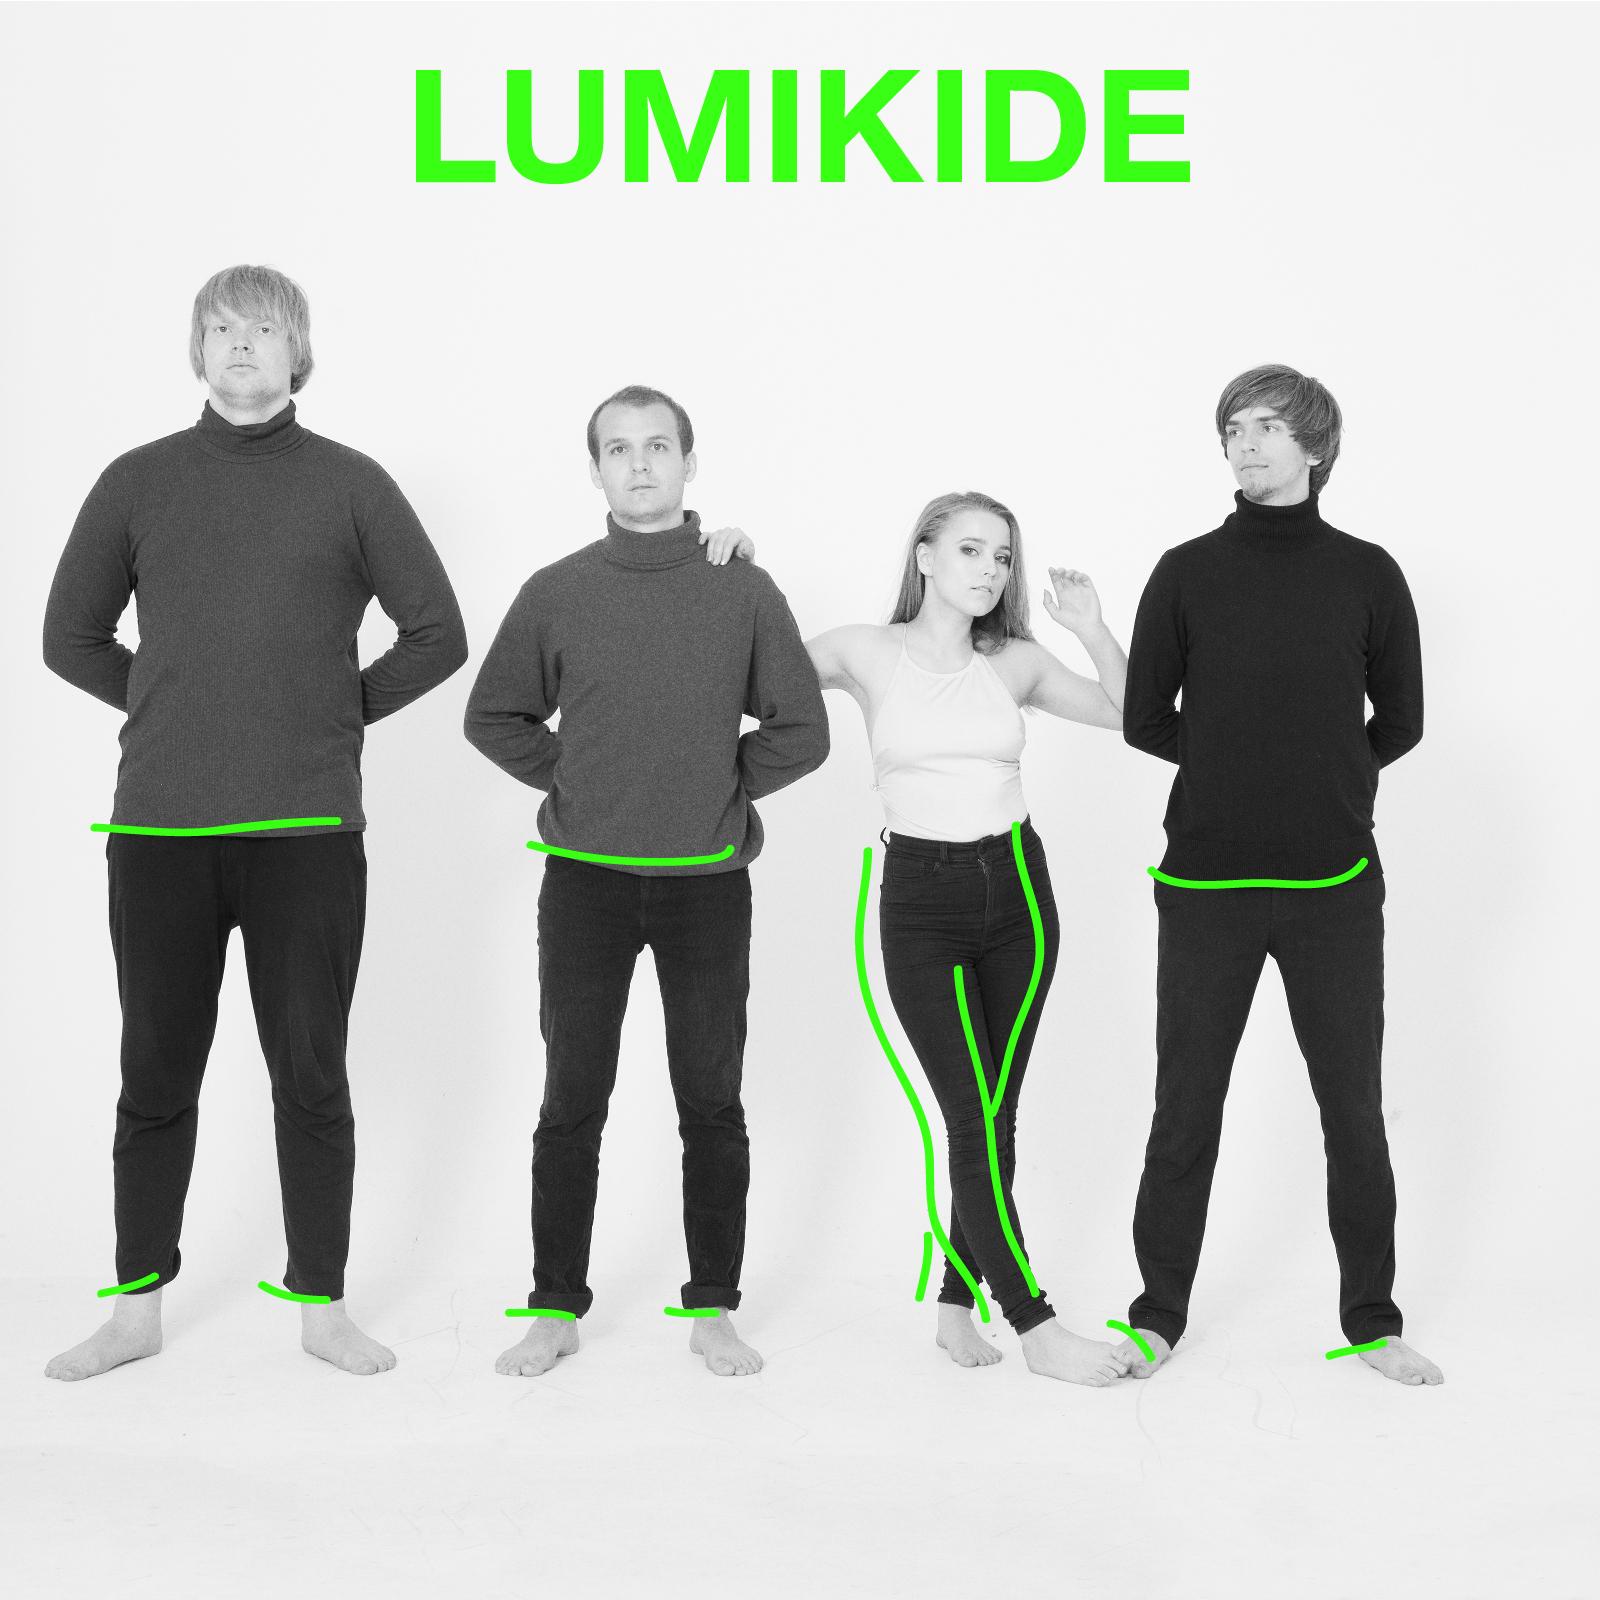 vvv_lumikide copy.jpg